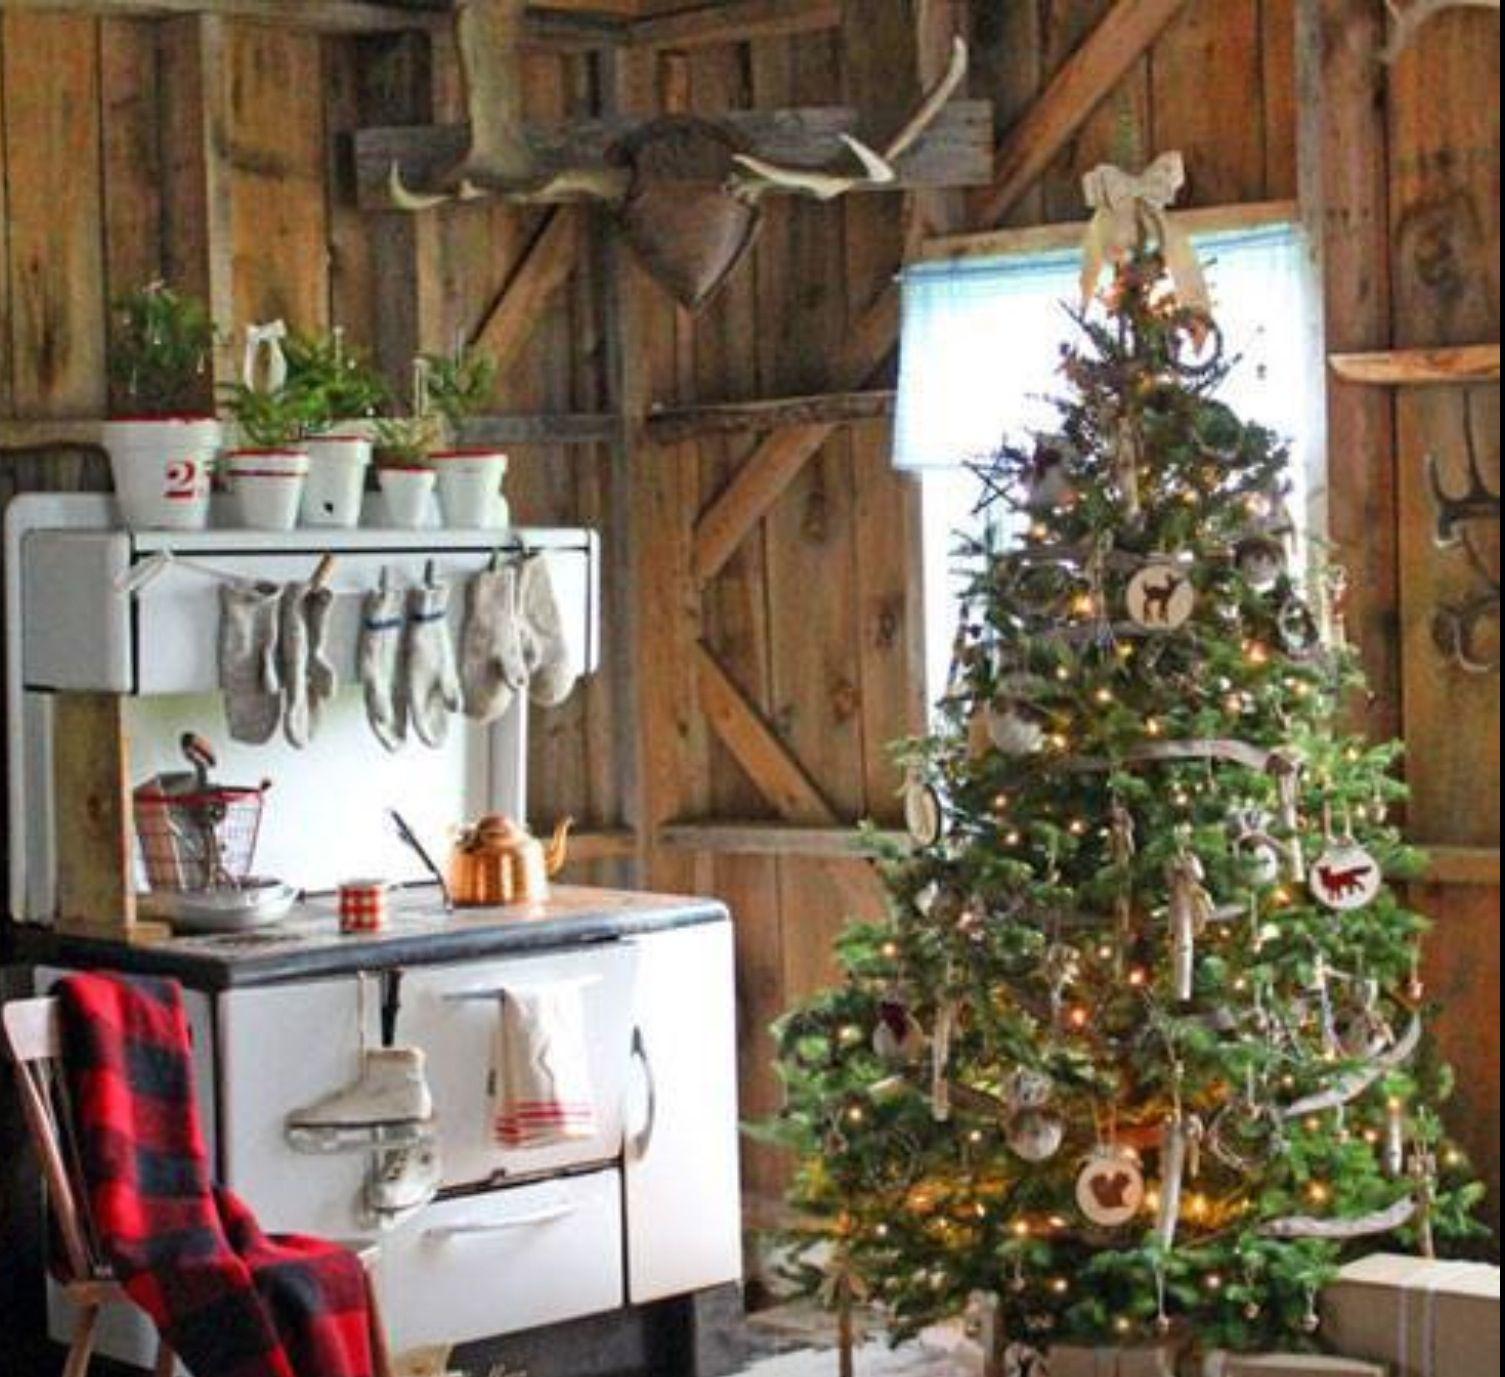 decorations interieur noel chalet decorations noel. Black Bedroom Furniture Sets. Home Design Ideas